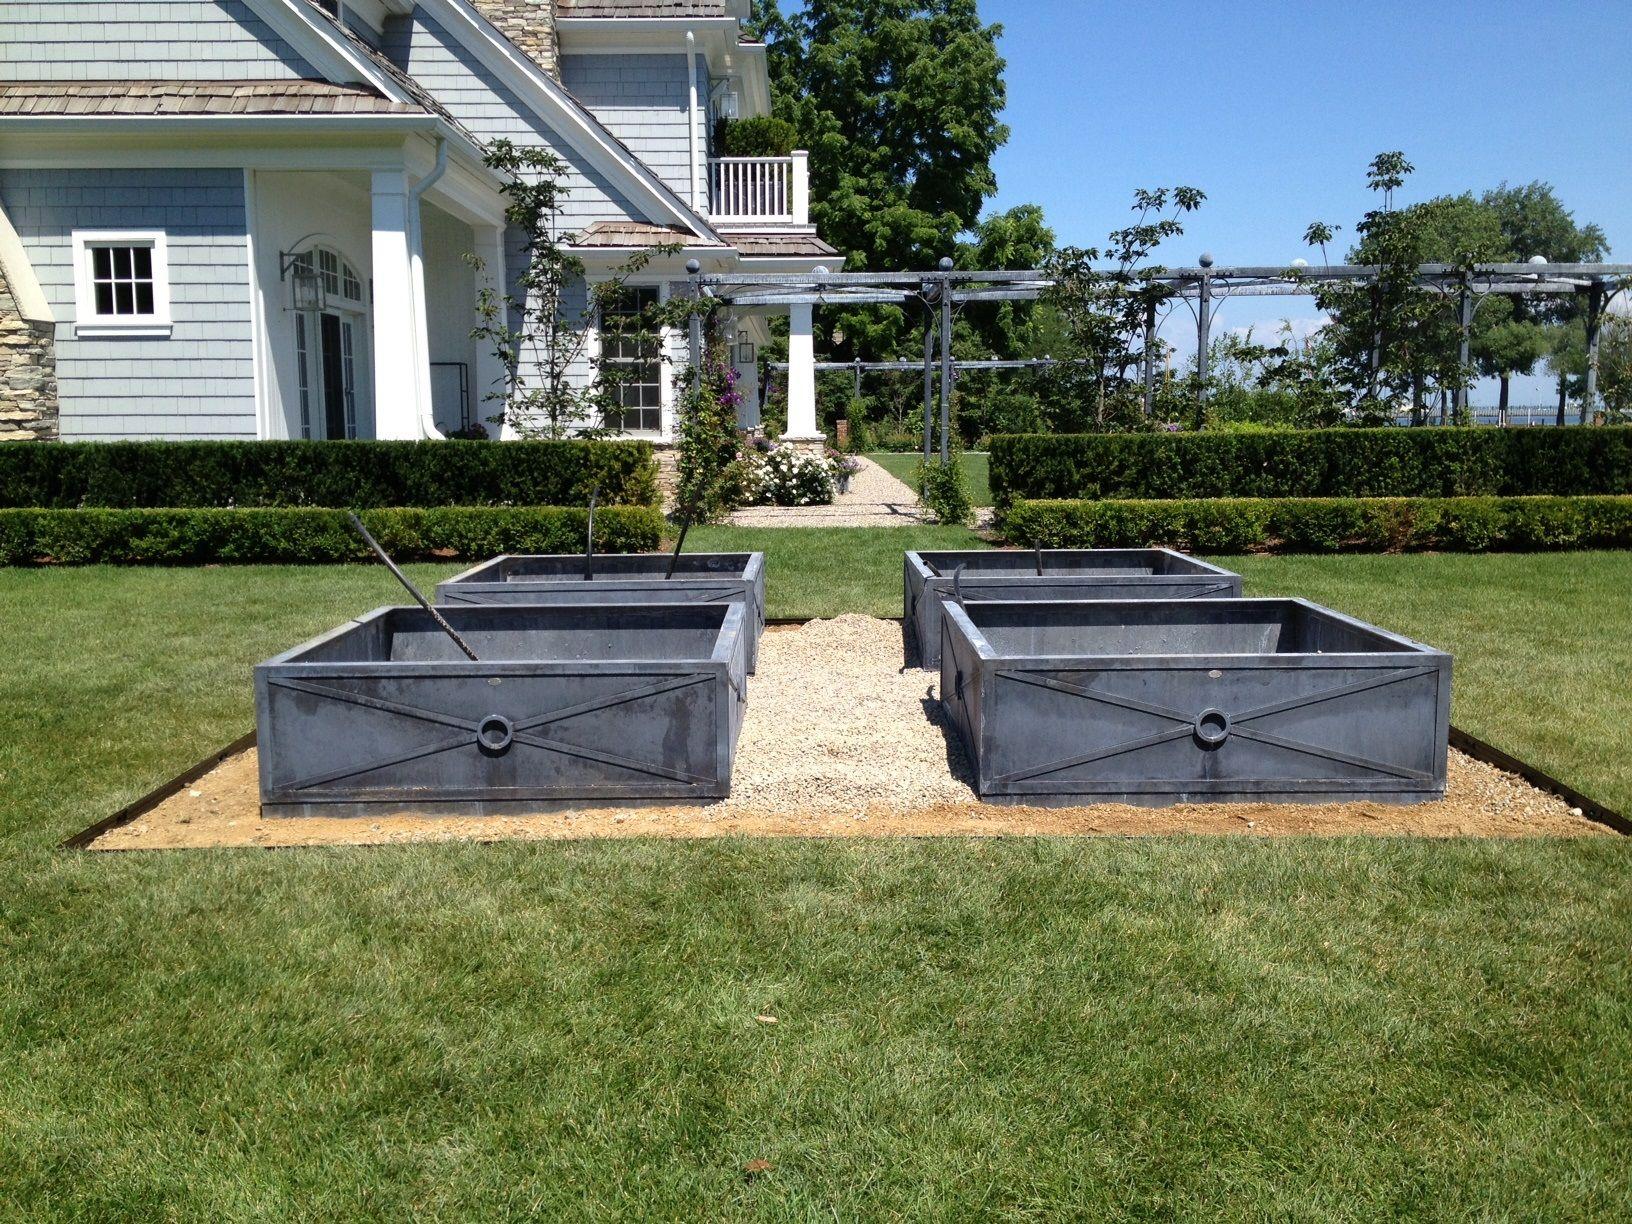 outdoor planter boxes. Pinned To Garden Design - Pots \u0026 Planters By Darin Bradbury. Outdoor Planter Boxes U